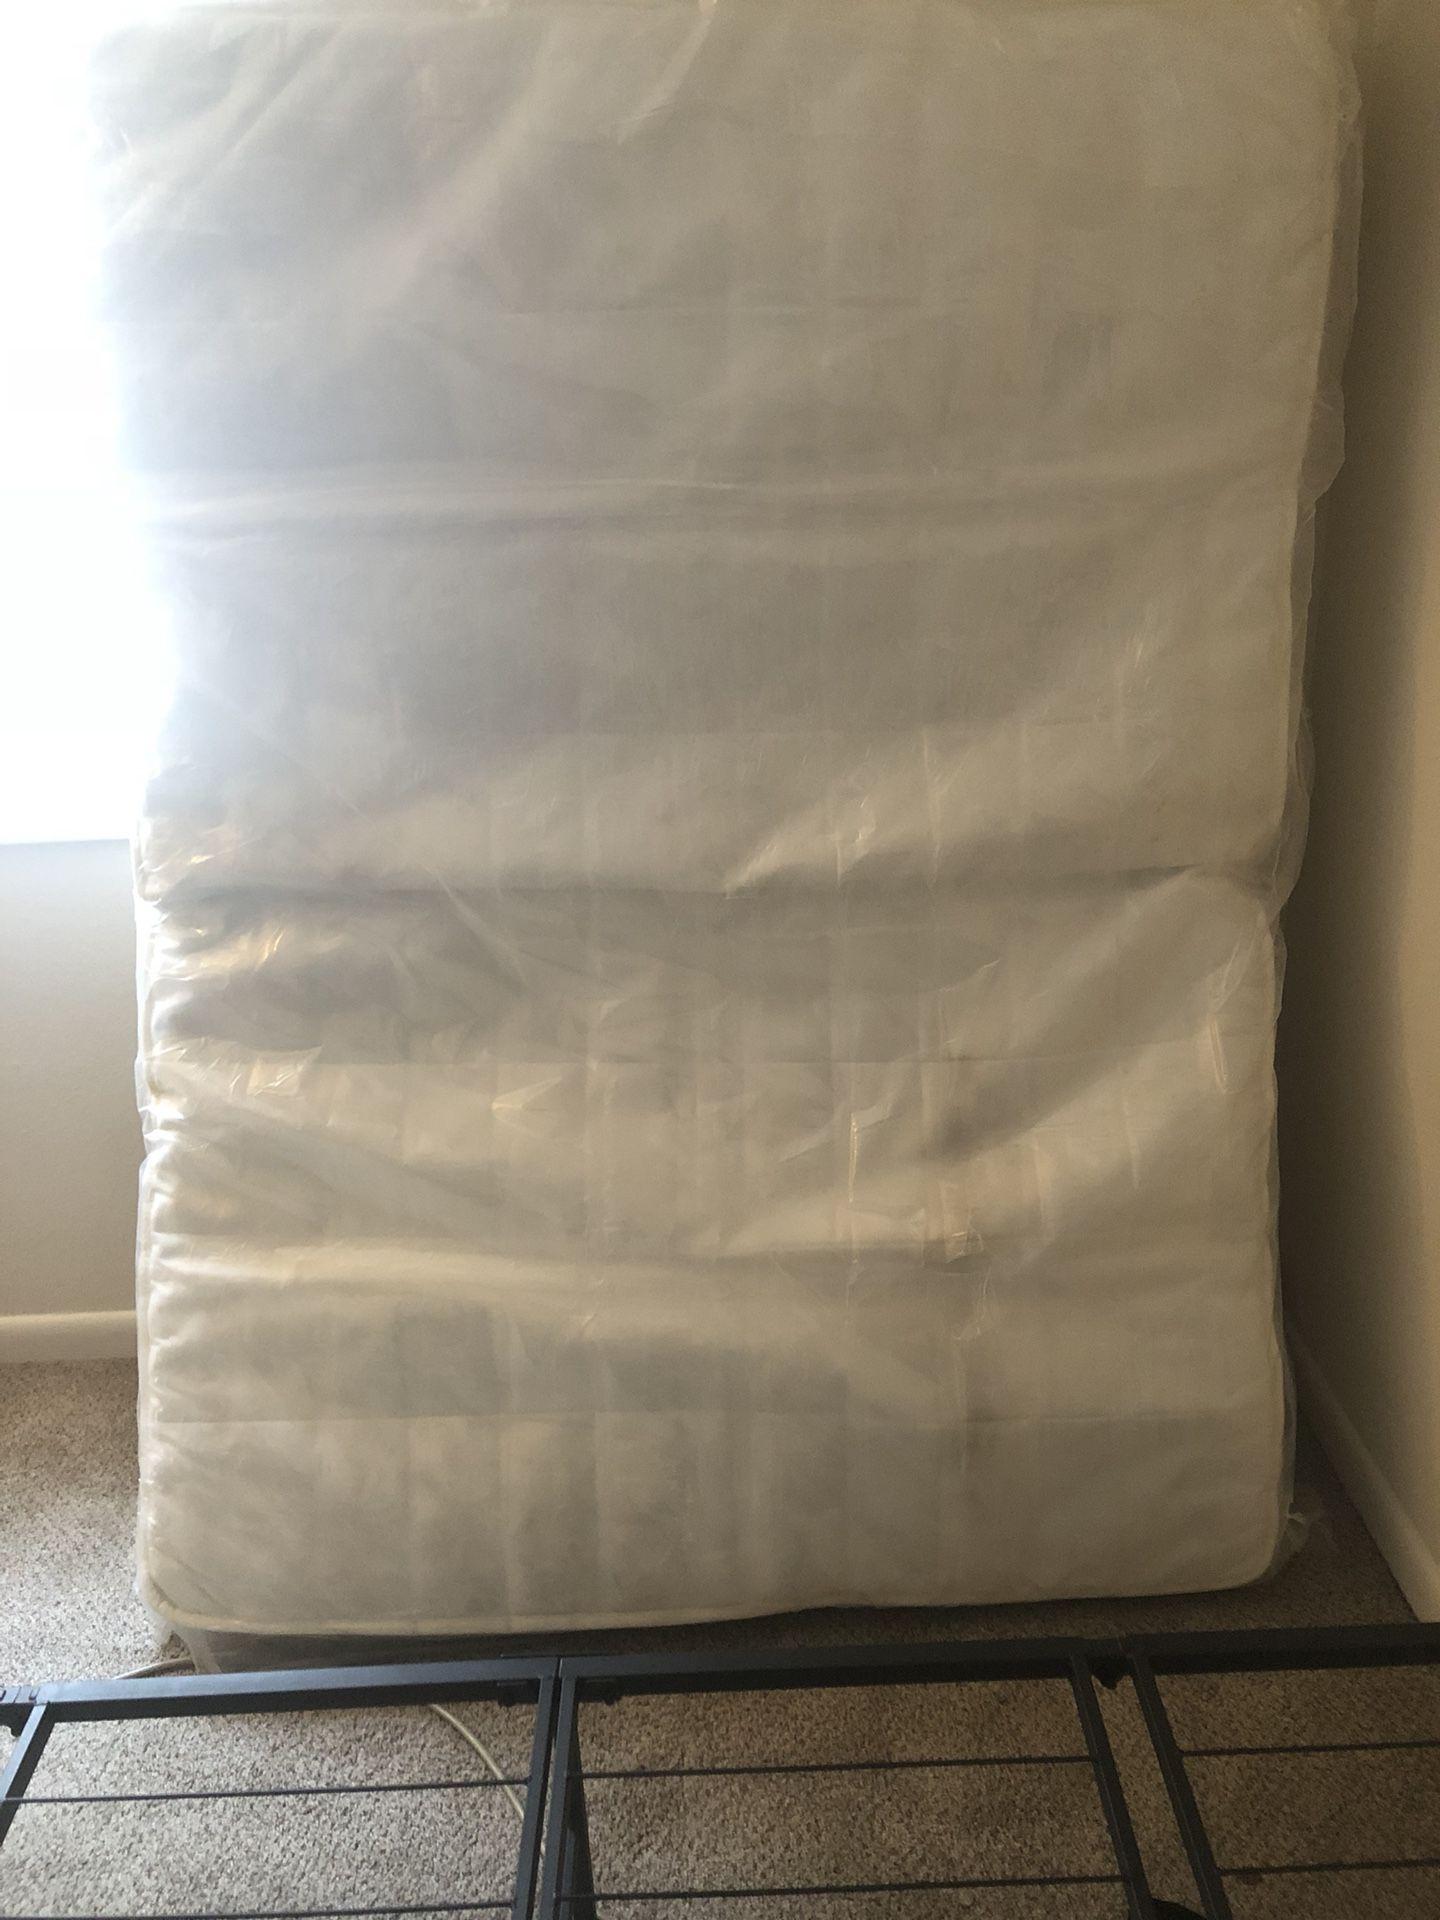 Full size mattress.